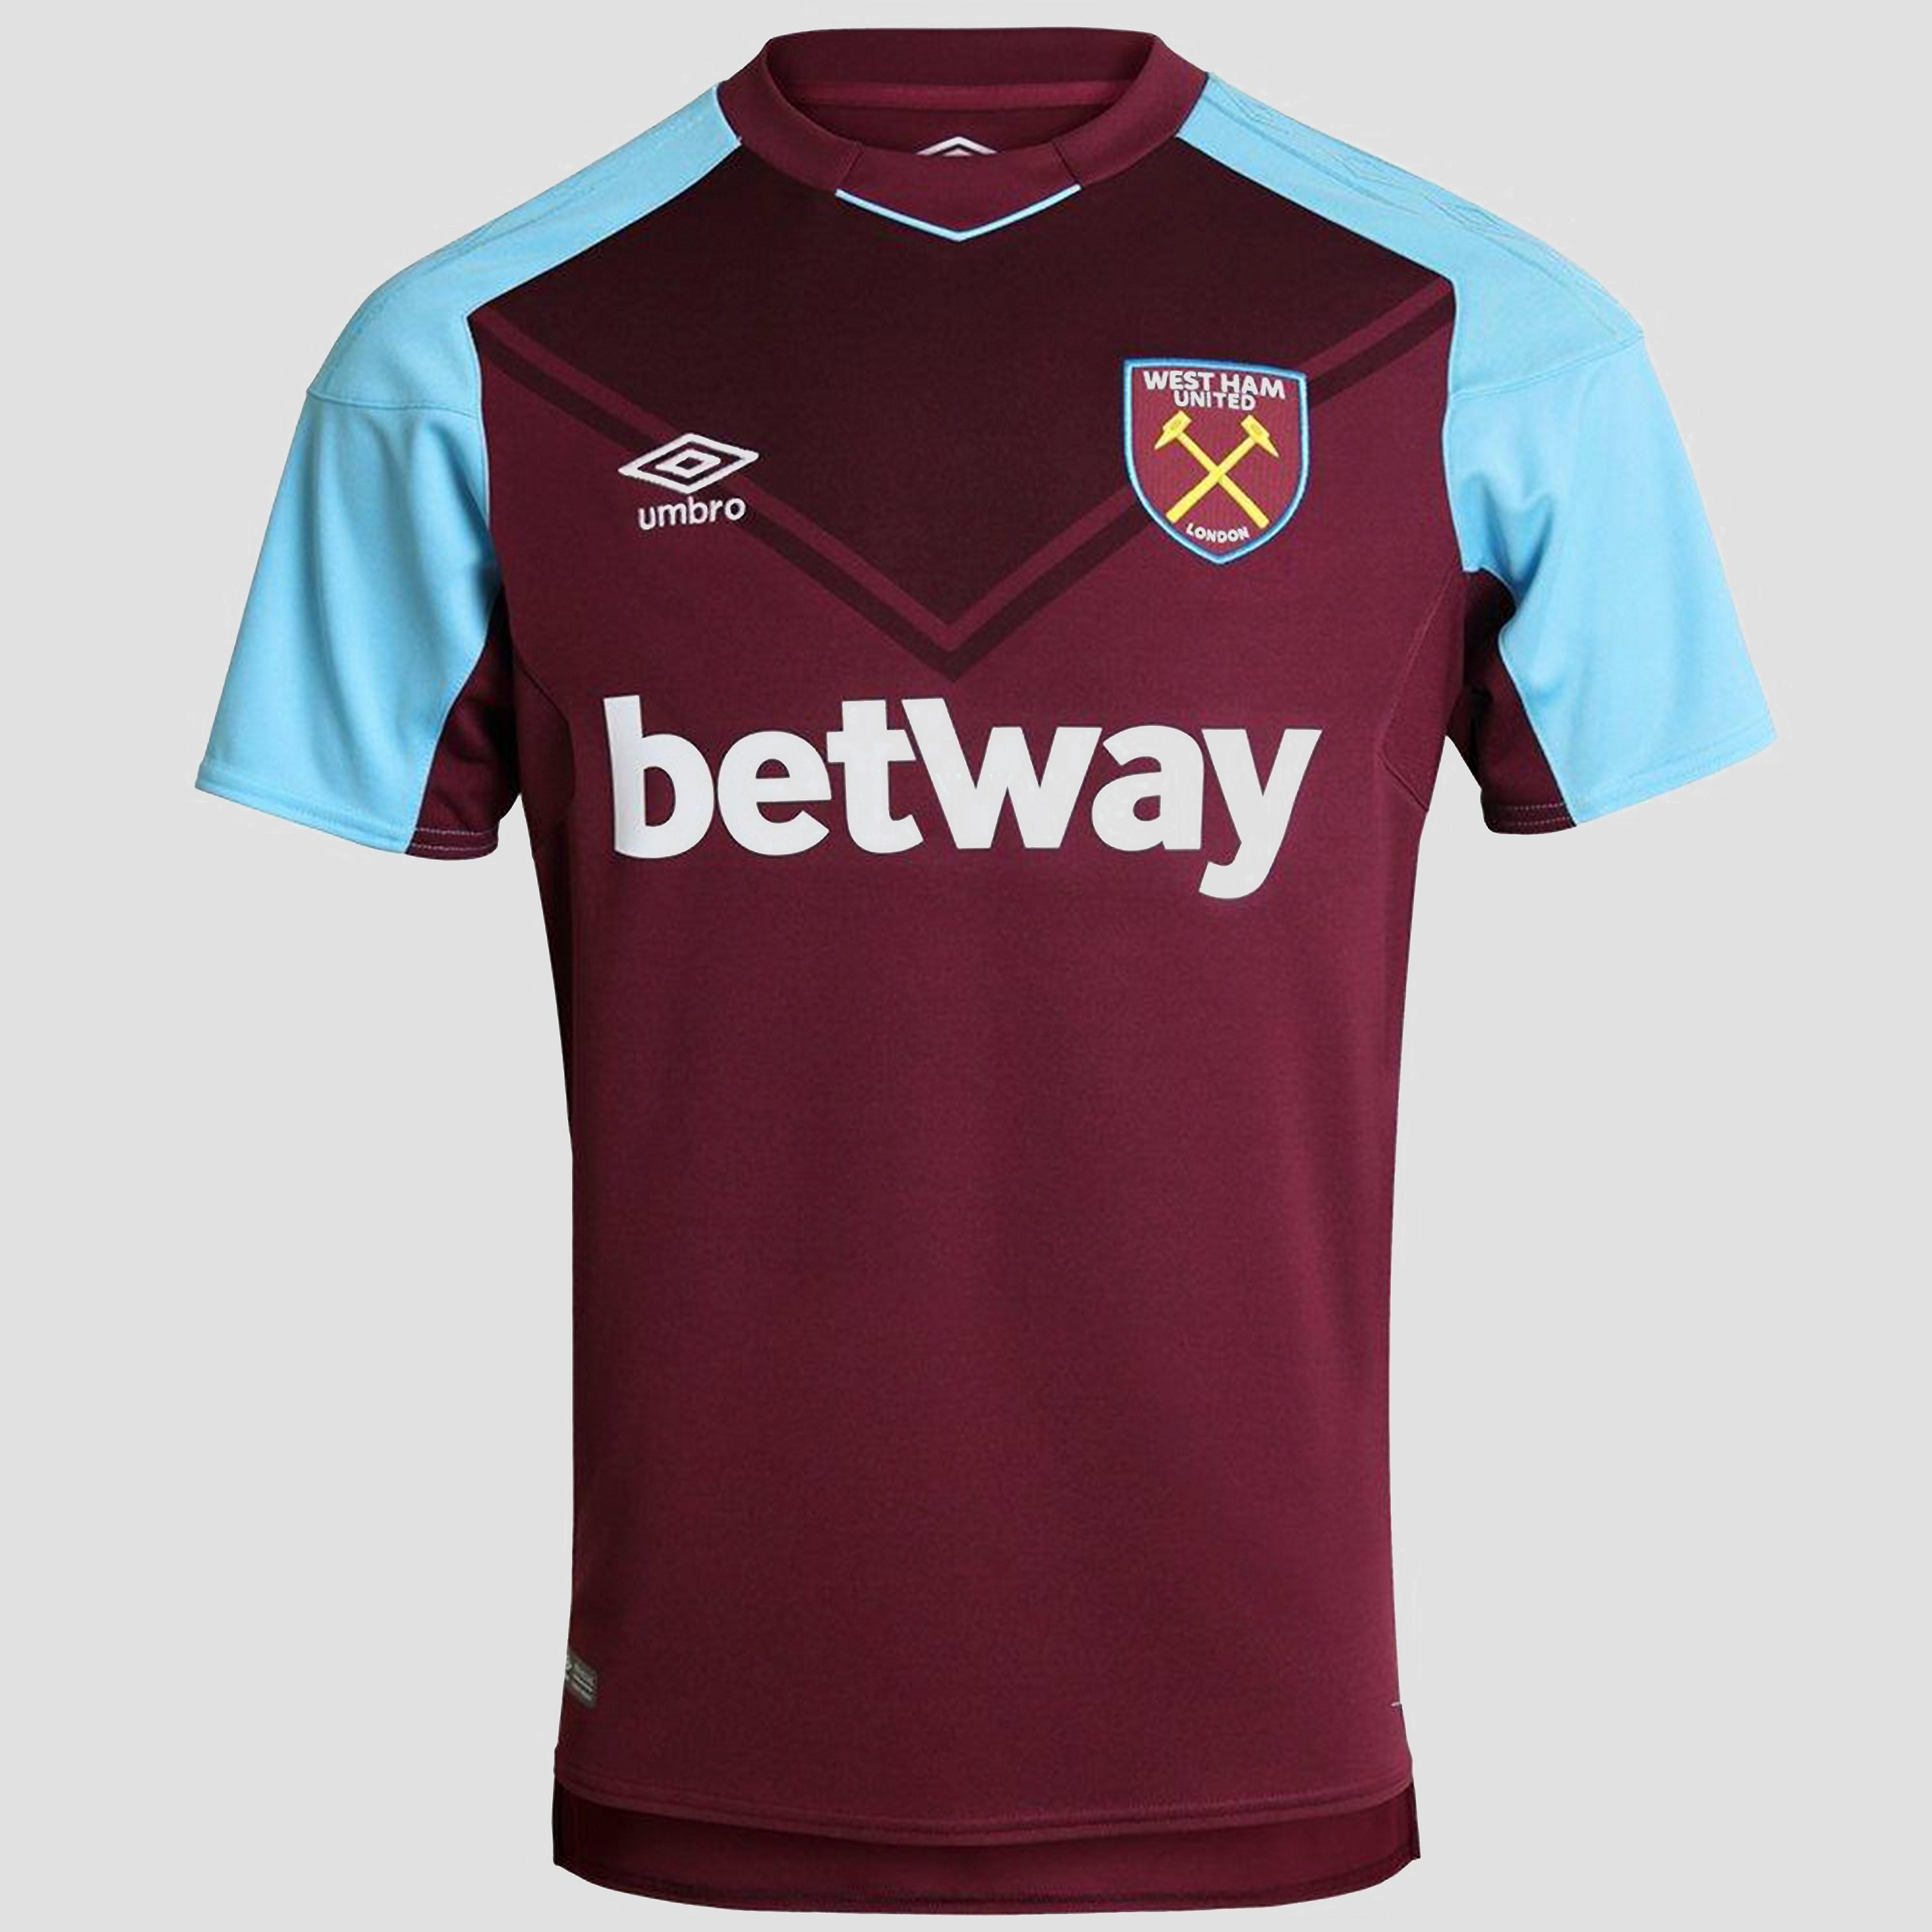 Umbro West Ham United Home 2017/18 Men's Shirt